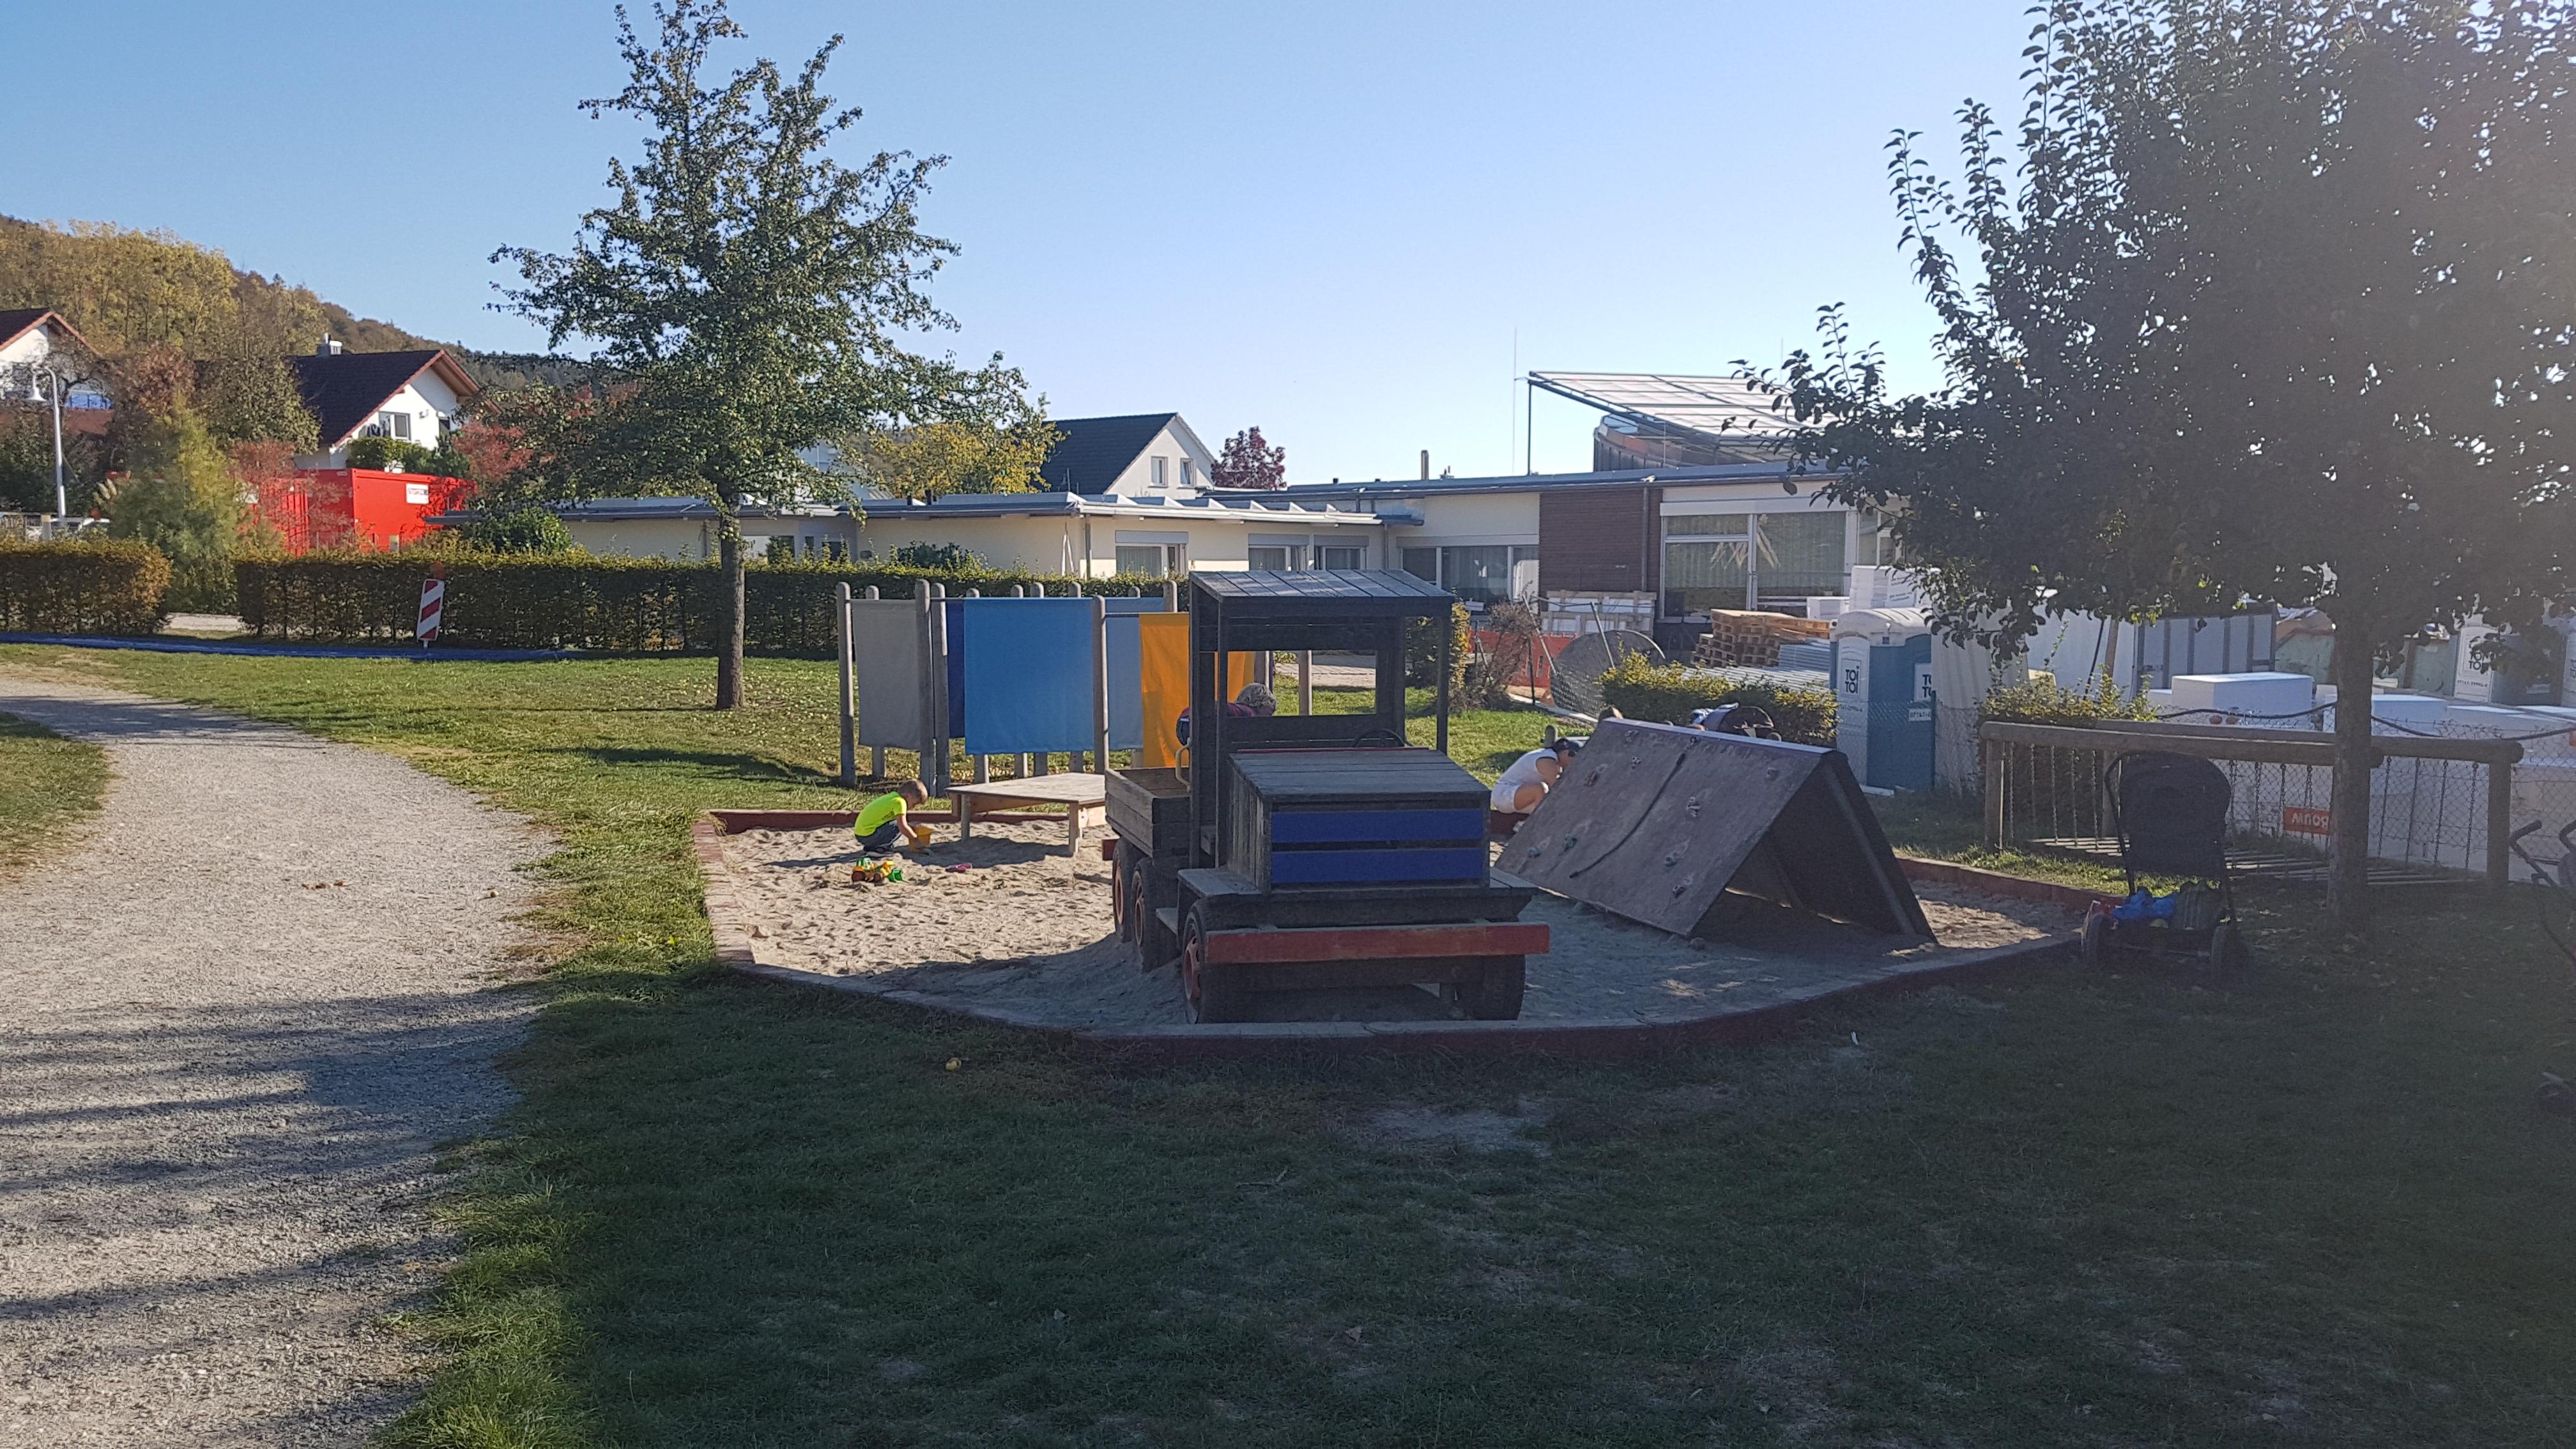 Spielplatz am Rehmenbach/Helianthum